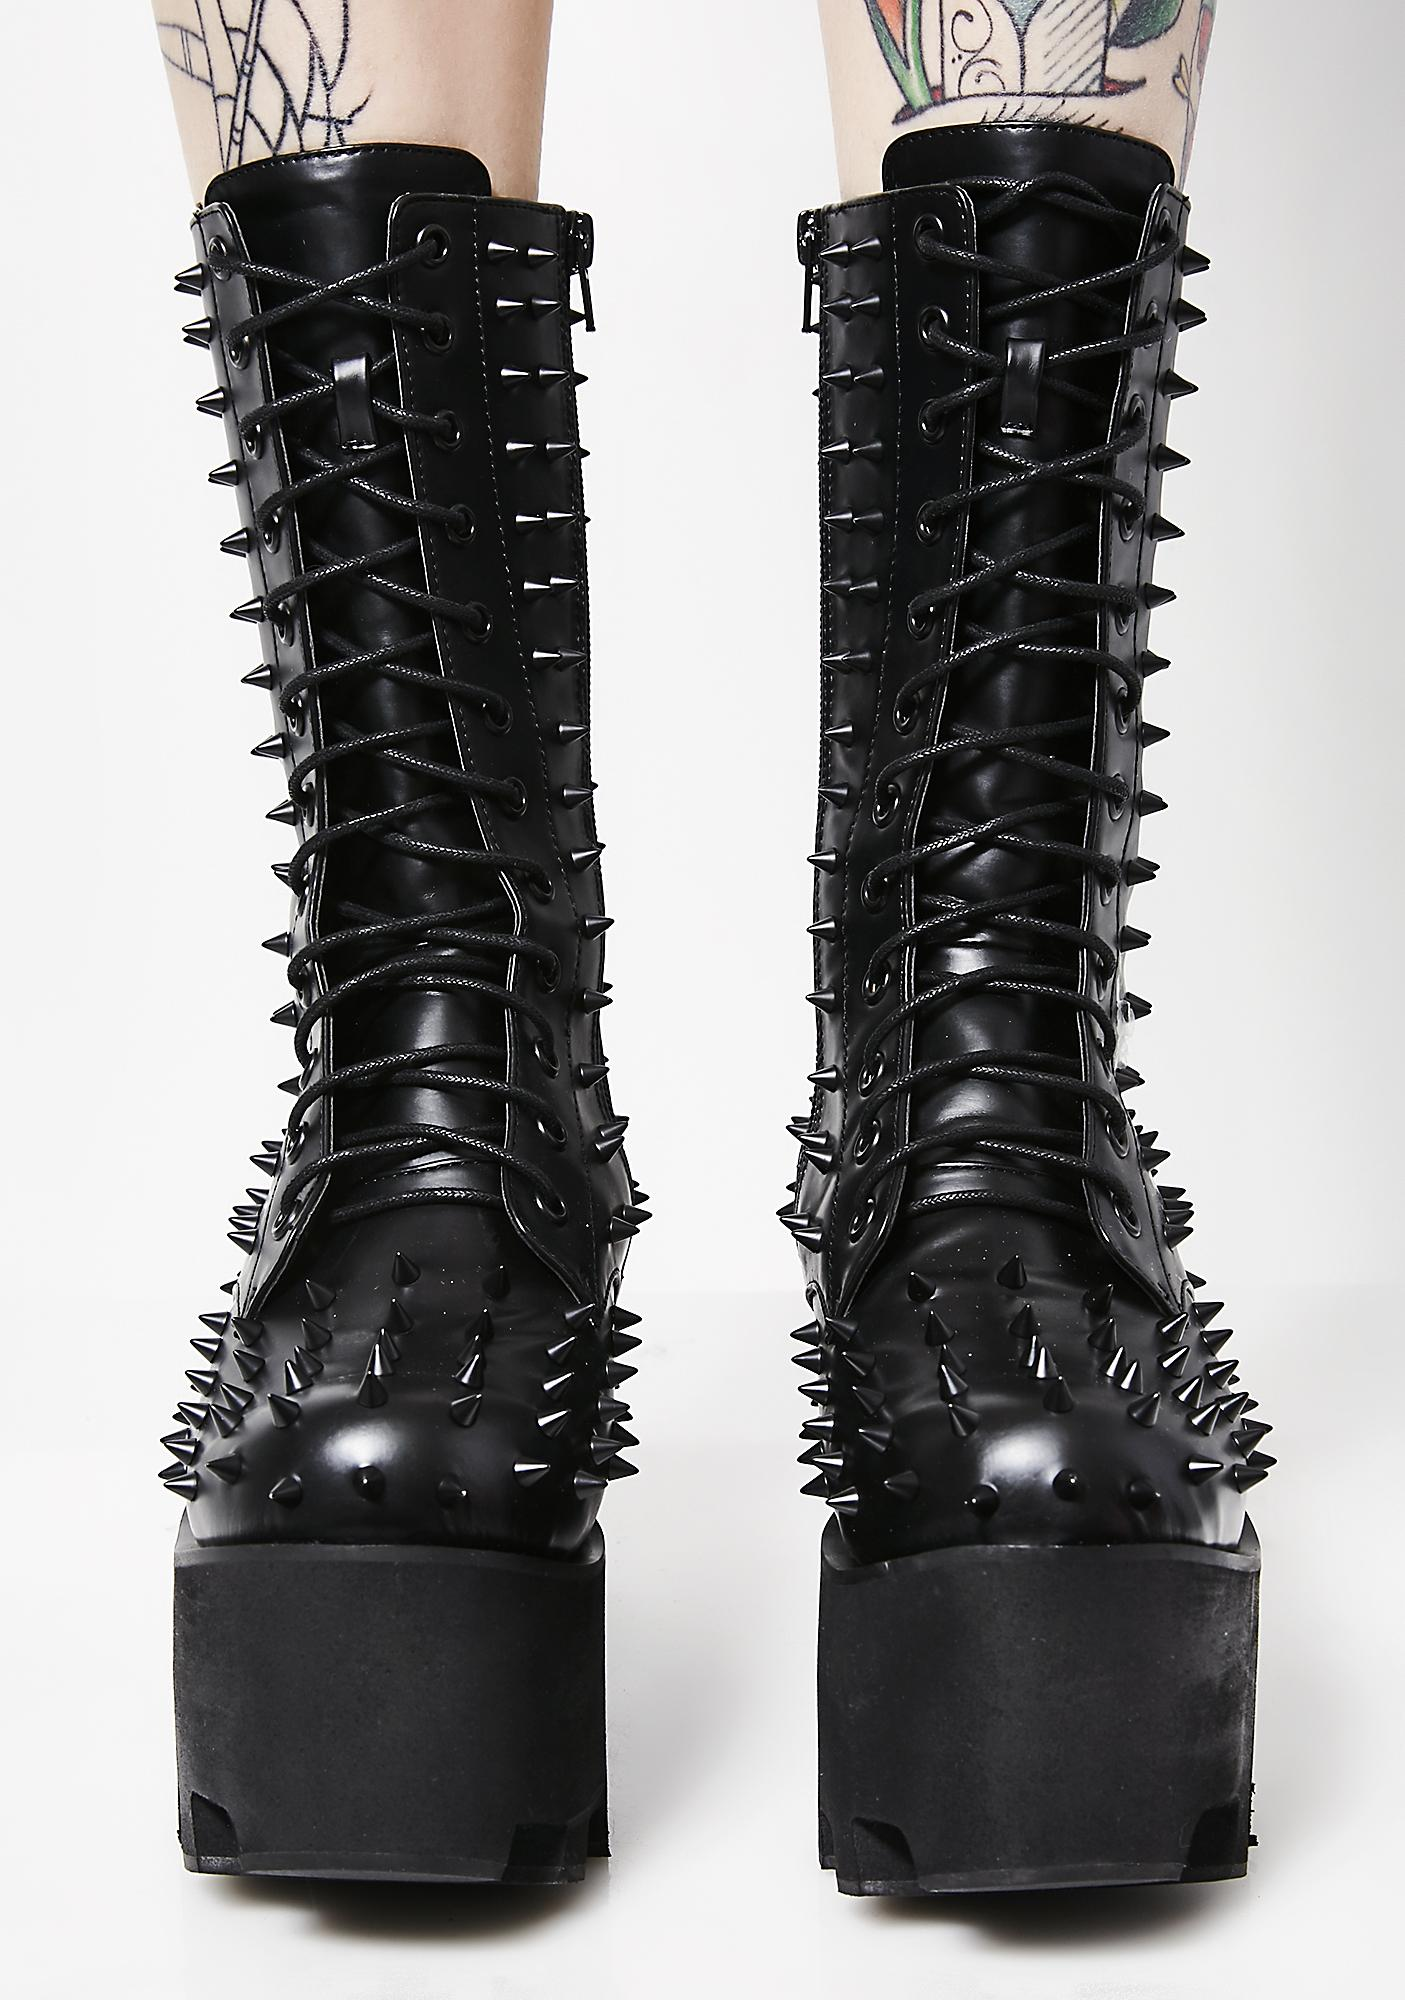 Charla Tedrick Black Metal Boots